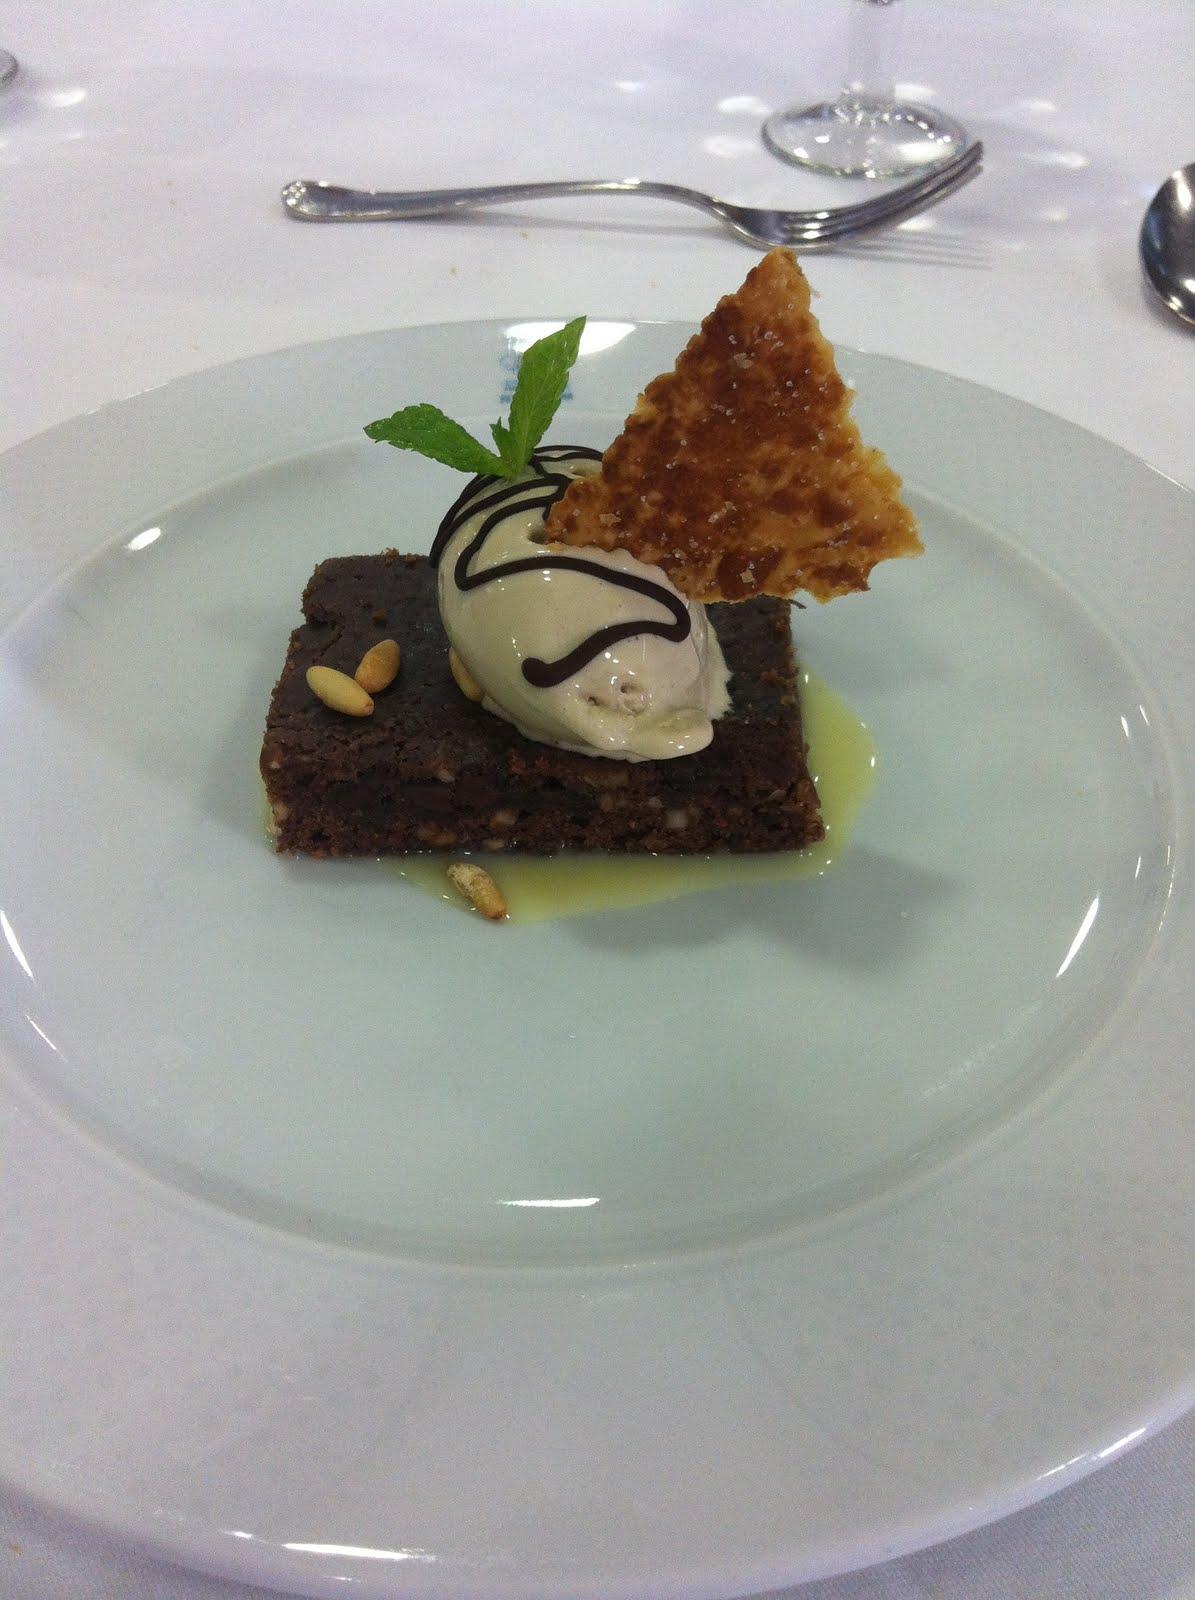 Escuela Hostelería Benalmádena Alumn@s de Cocina - Recetas: Brownie ...